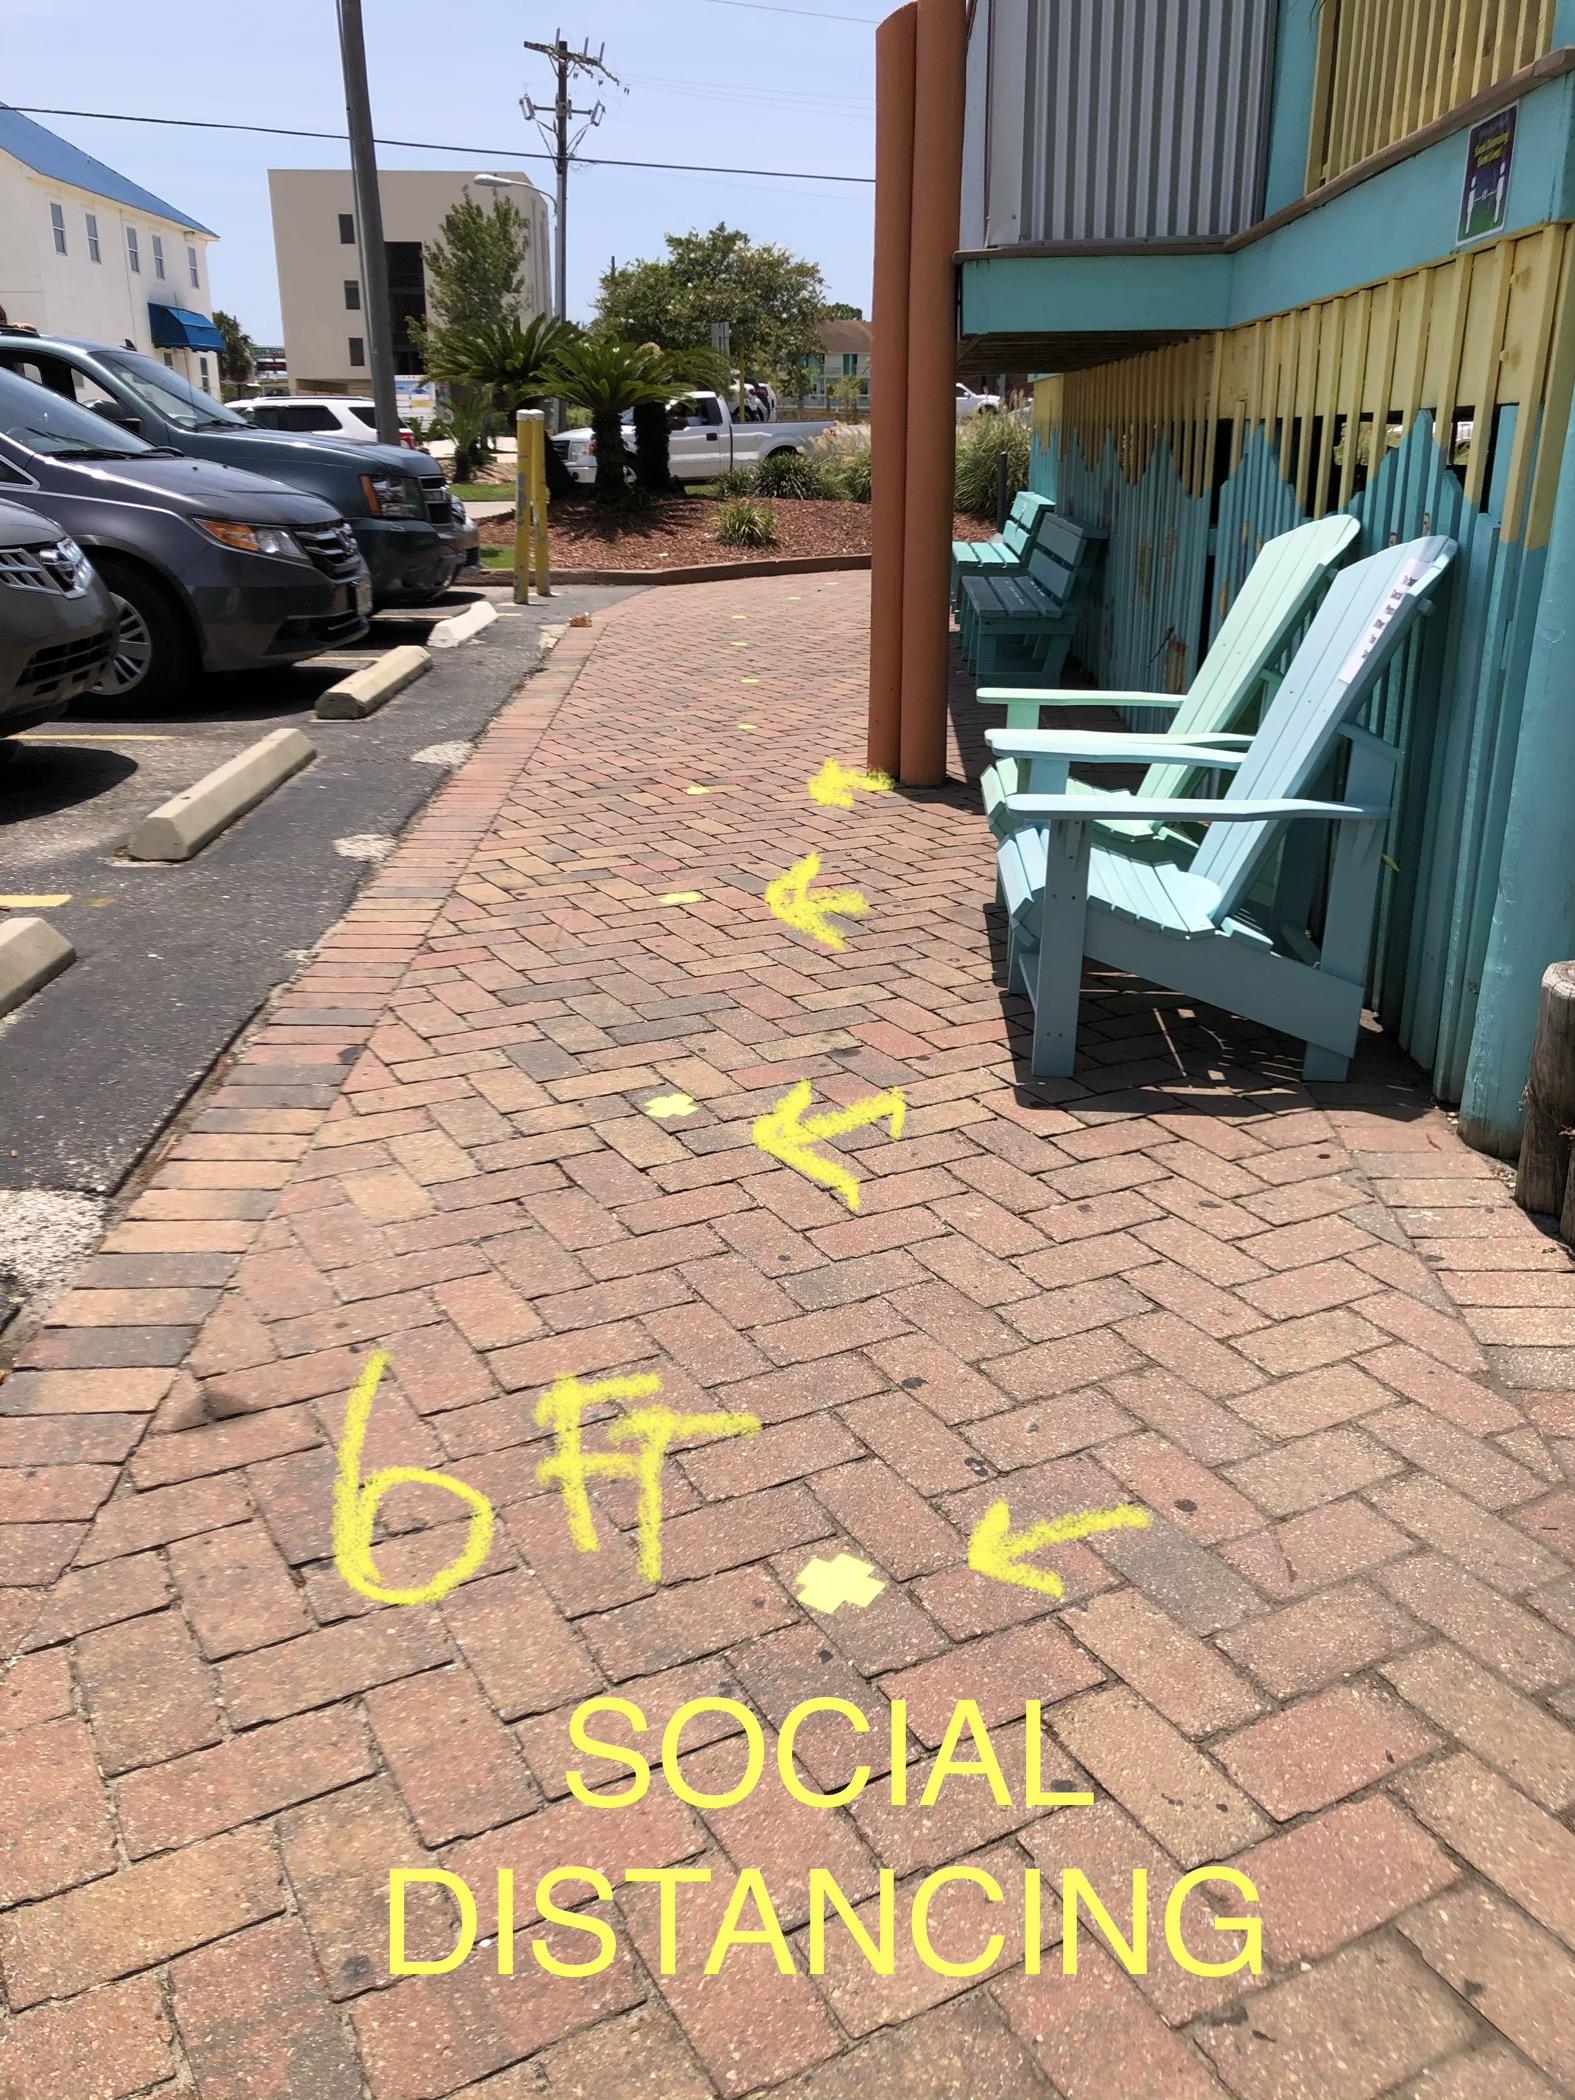 6 Feet Social Distance Fluorescent Yellow Tape to mark every 6 feet